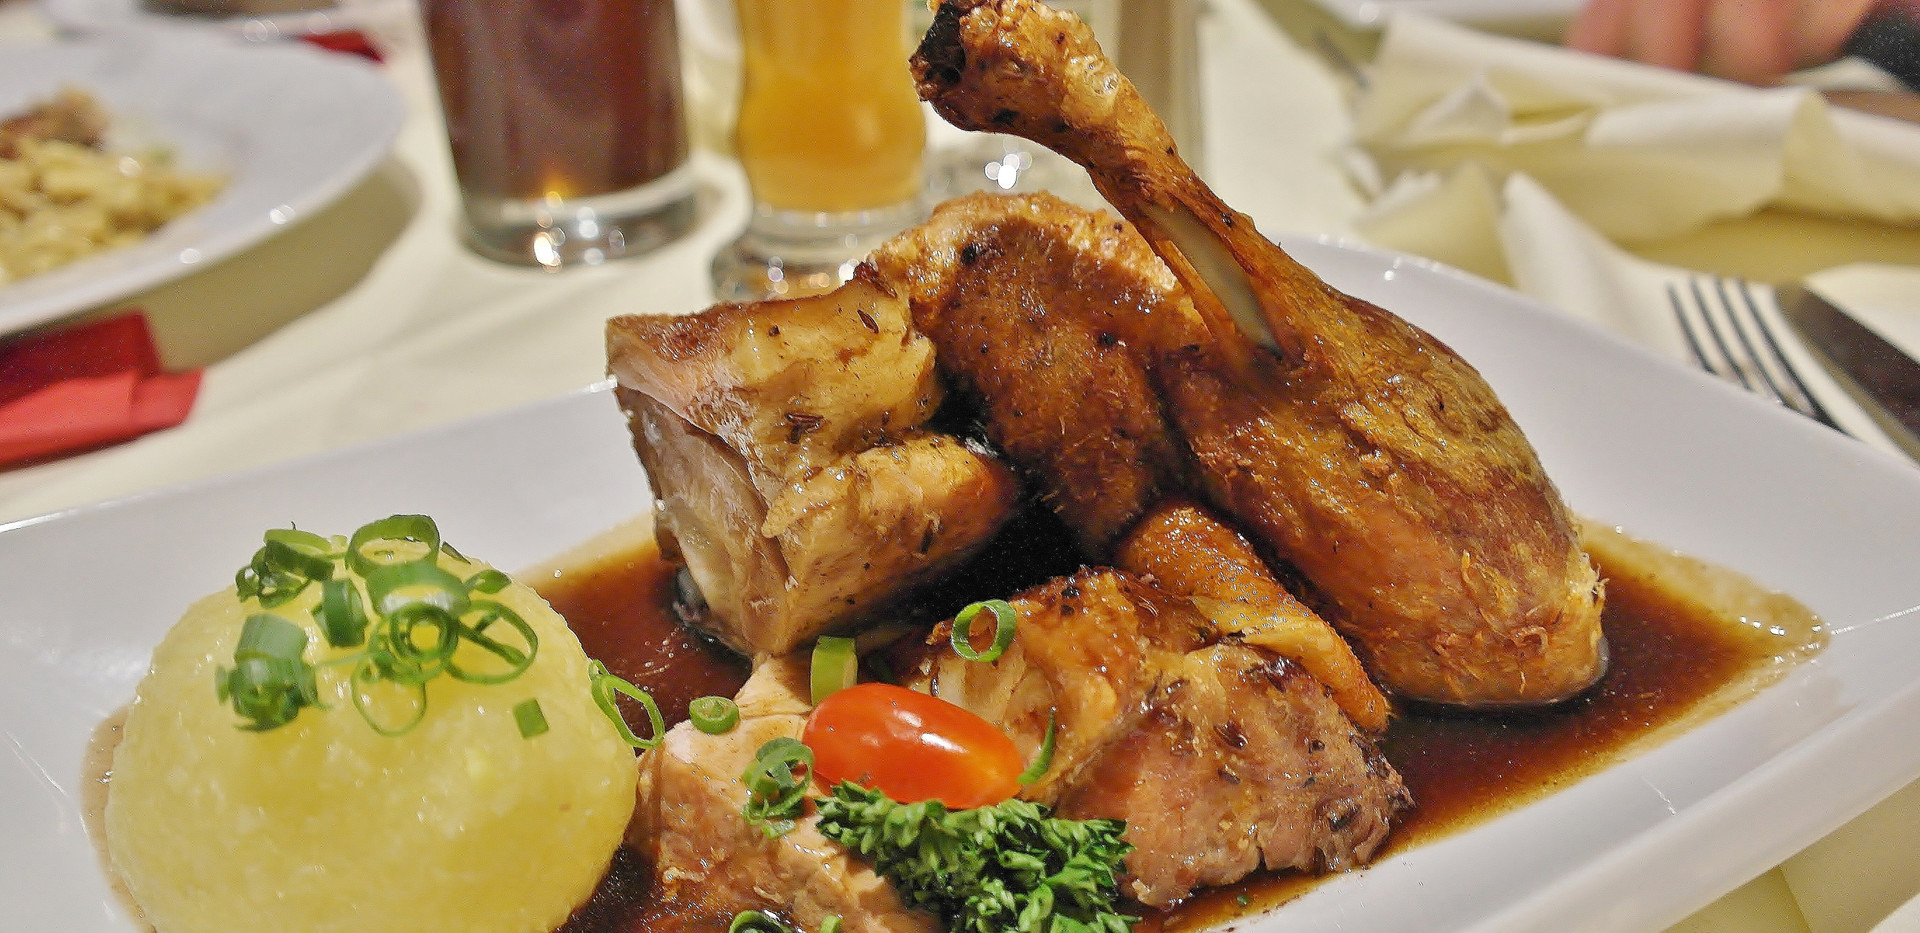 chicken-dinner-dish-236781.jpg